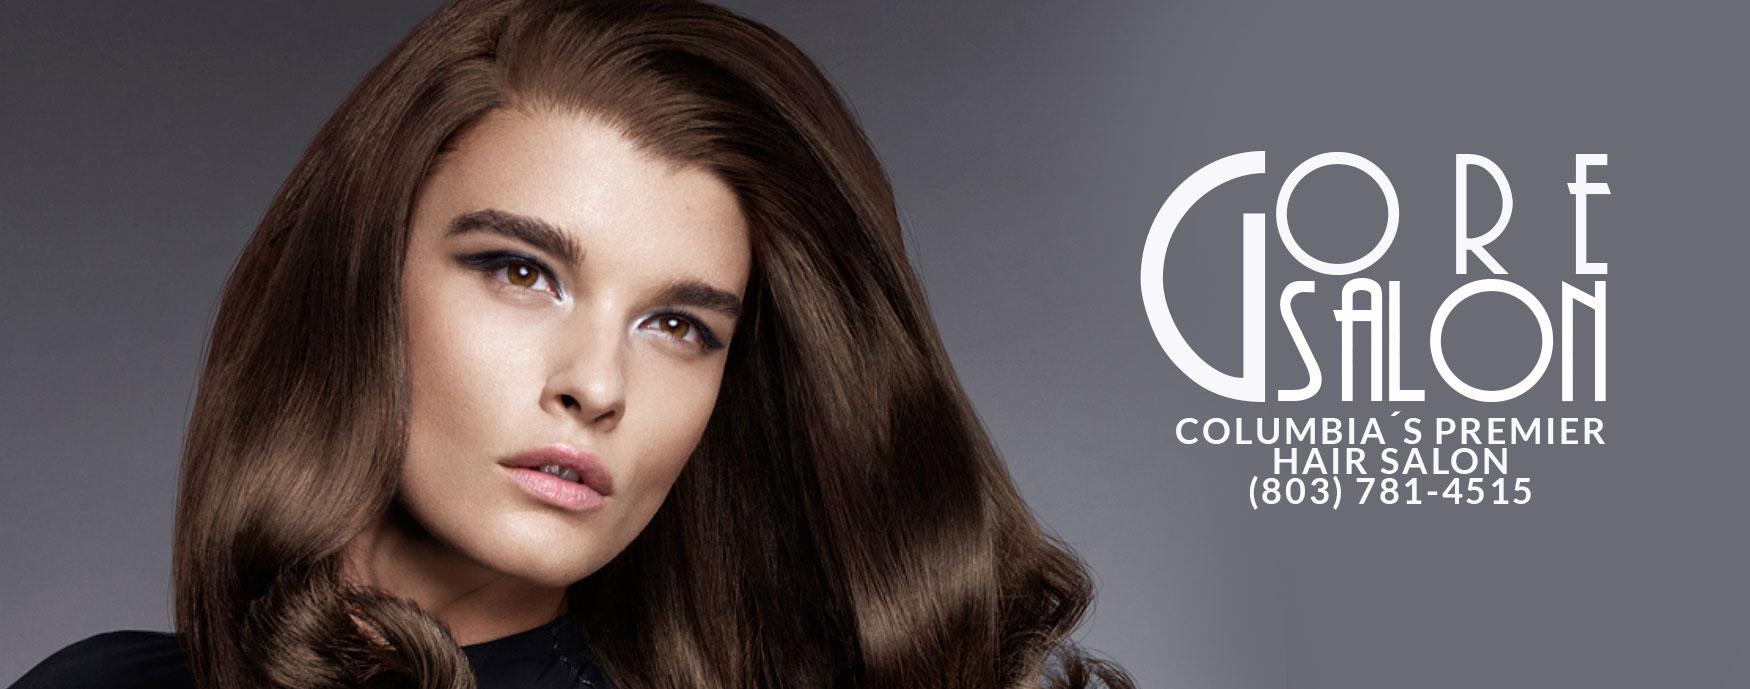 Gore Salon Irmo Columbia Hair Color Hairstyles Makeup